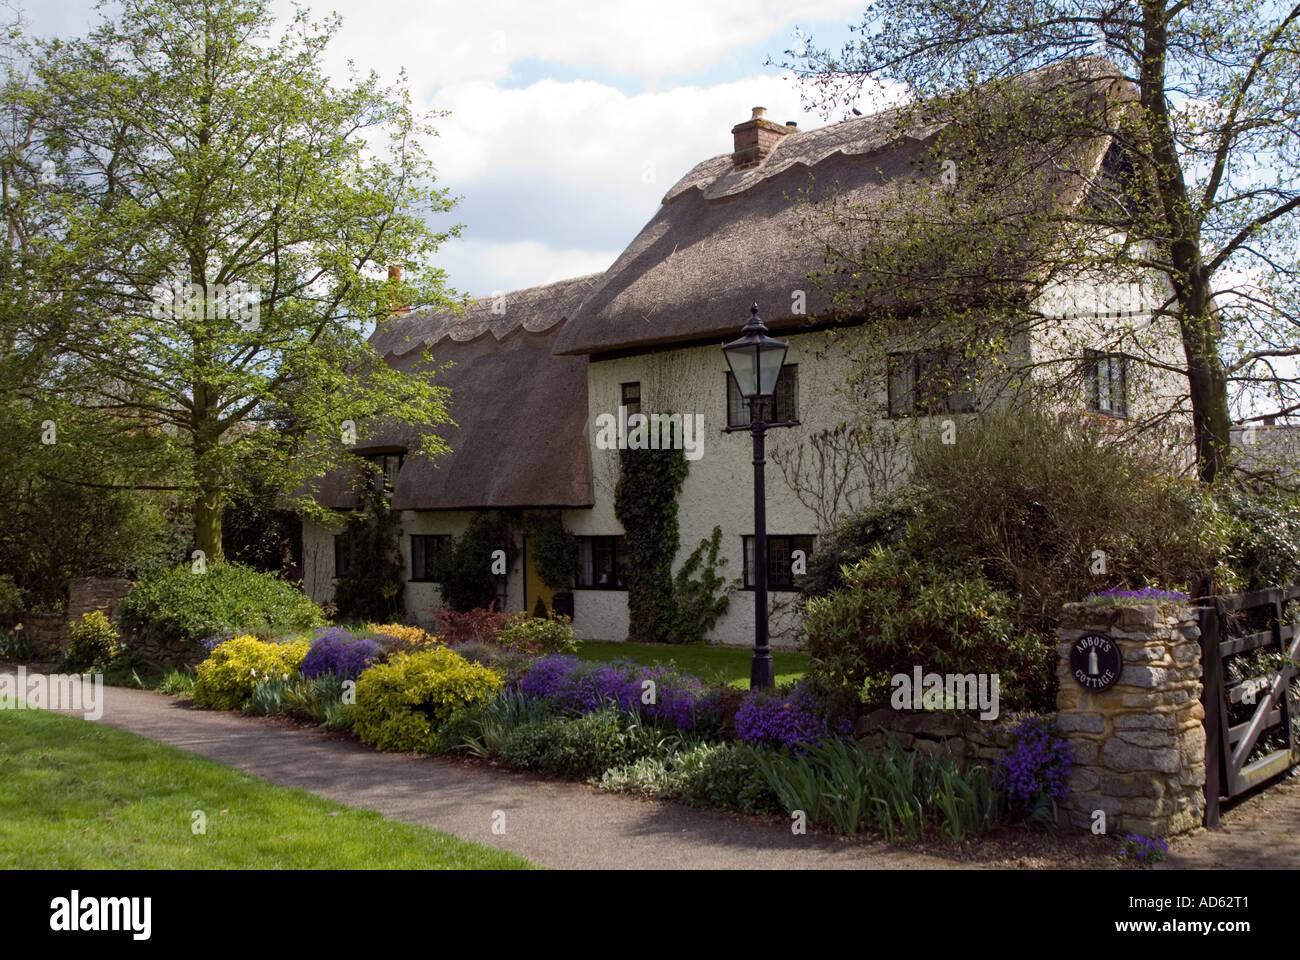 PICTURE CREDIT DOUG BLANE Milton Keynes village - Stock Image